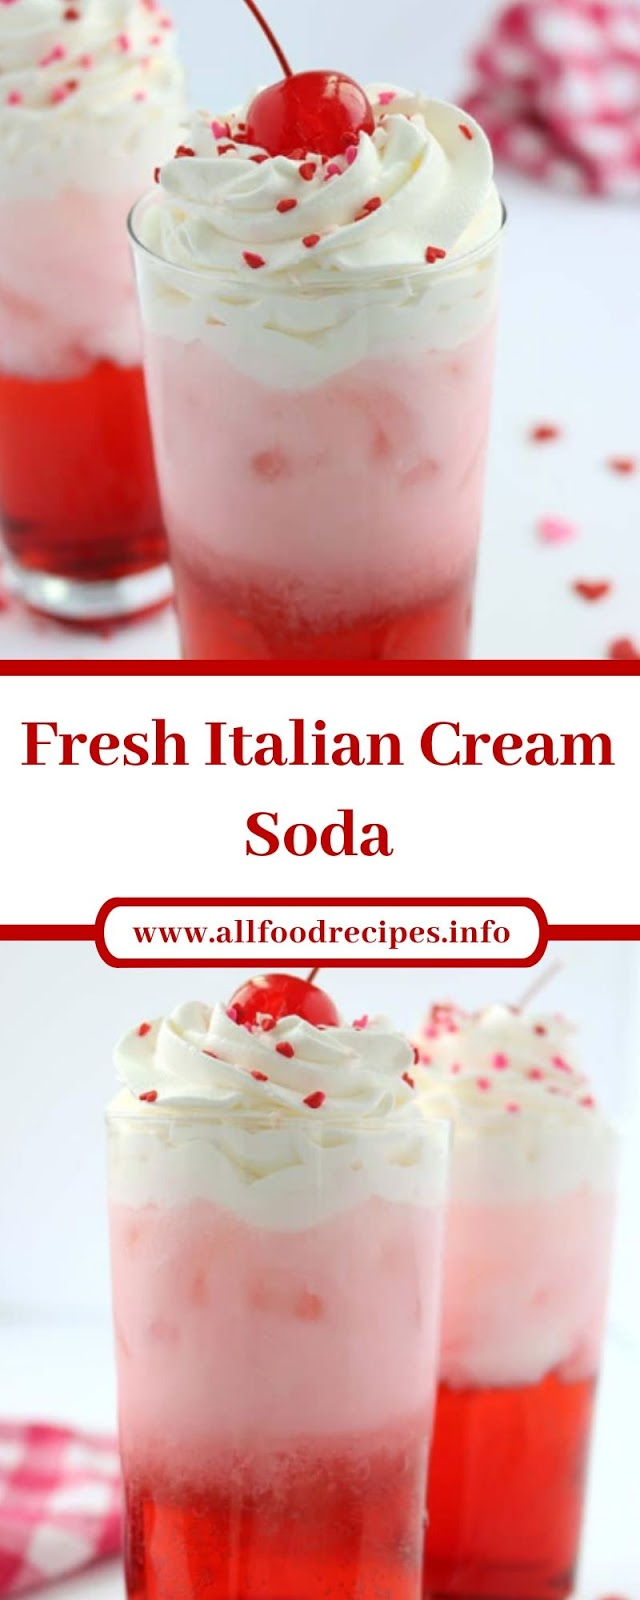 Fresh Italian Cream Soda